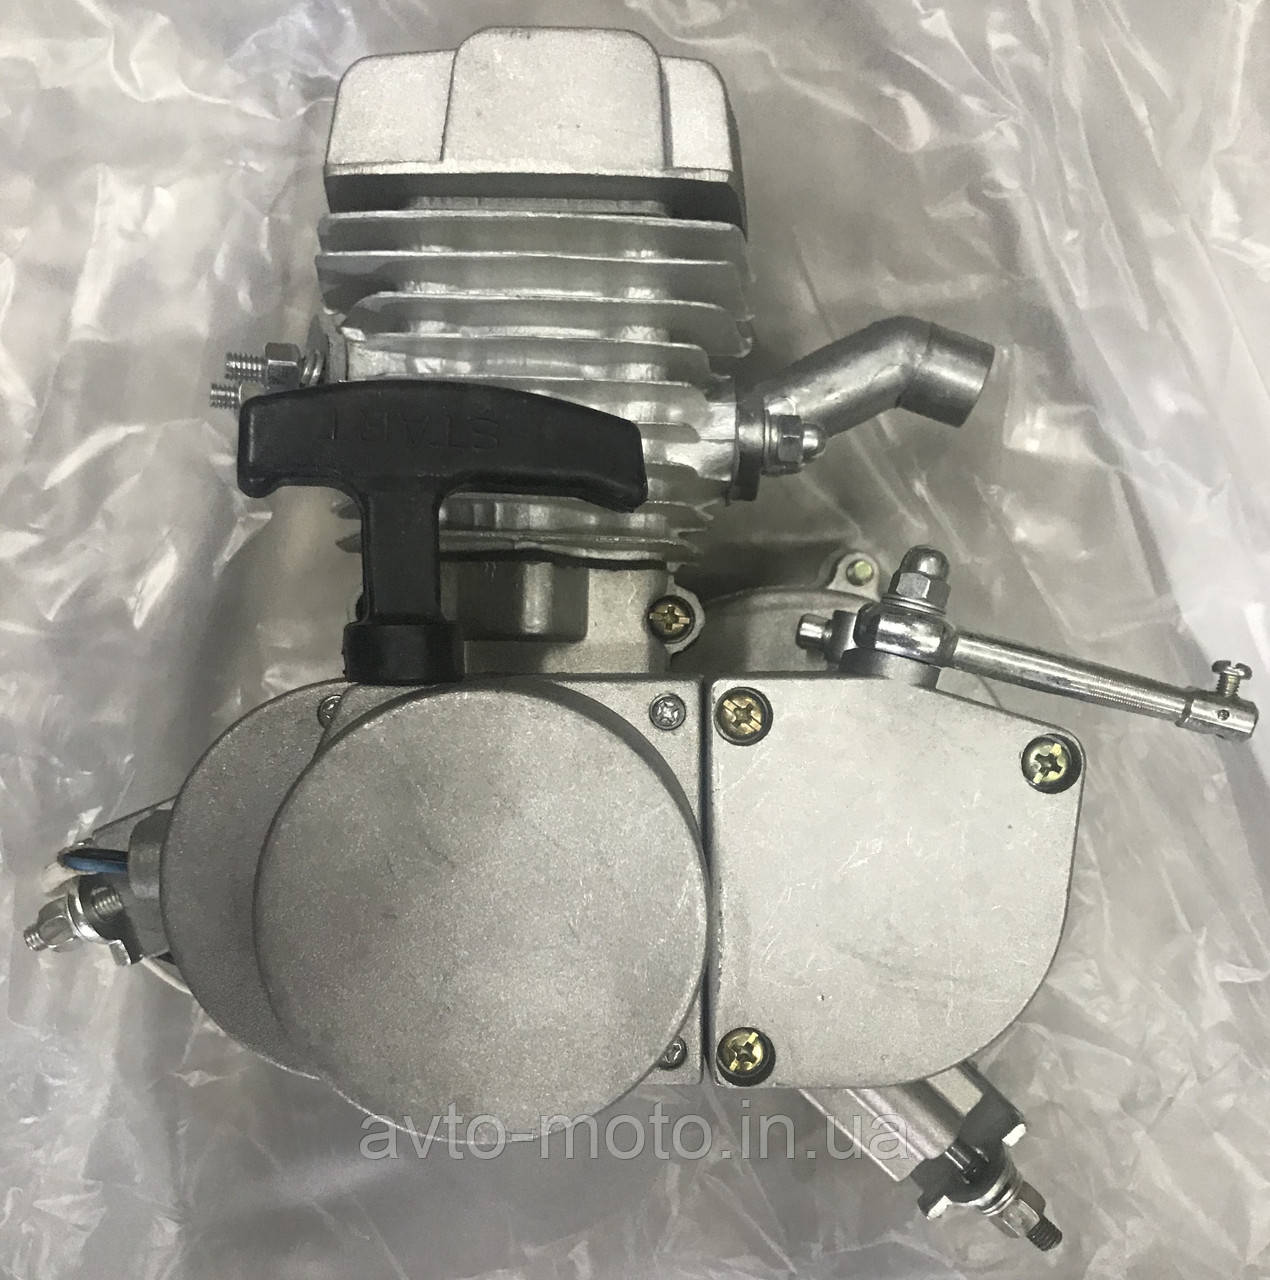 Веломотор дырчик F50 со стартером (без комплекта)